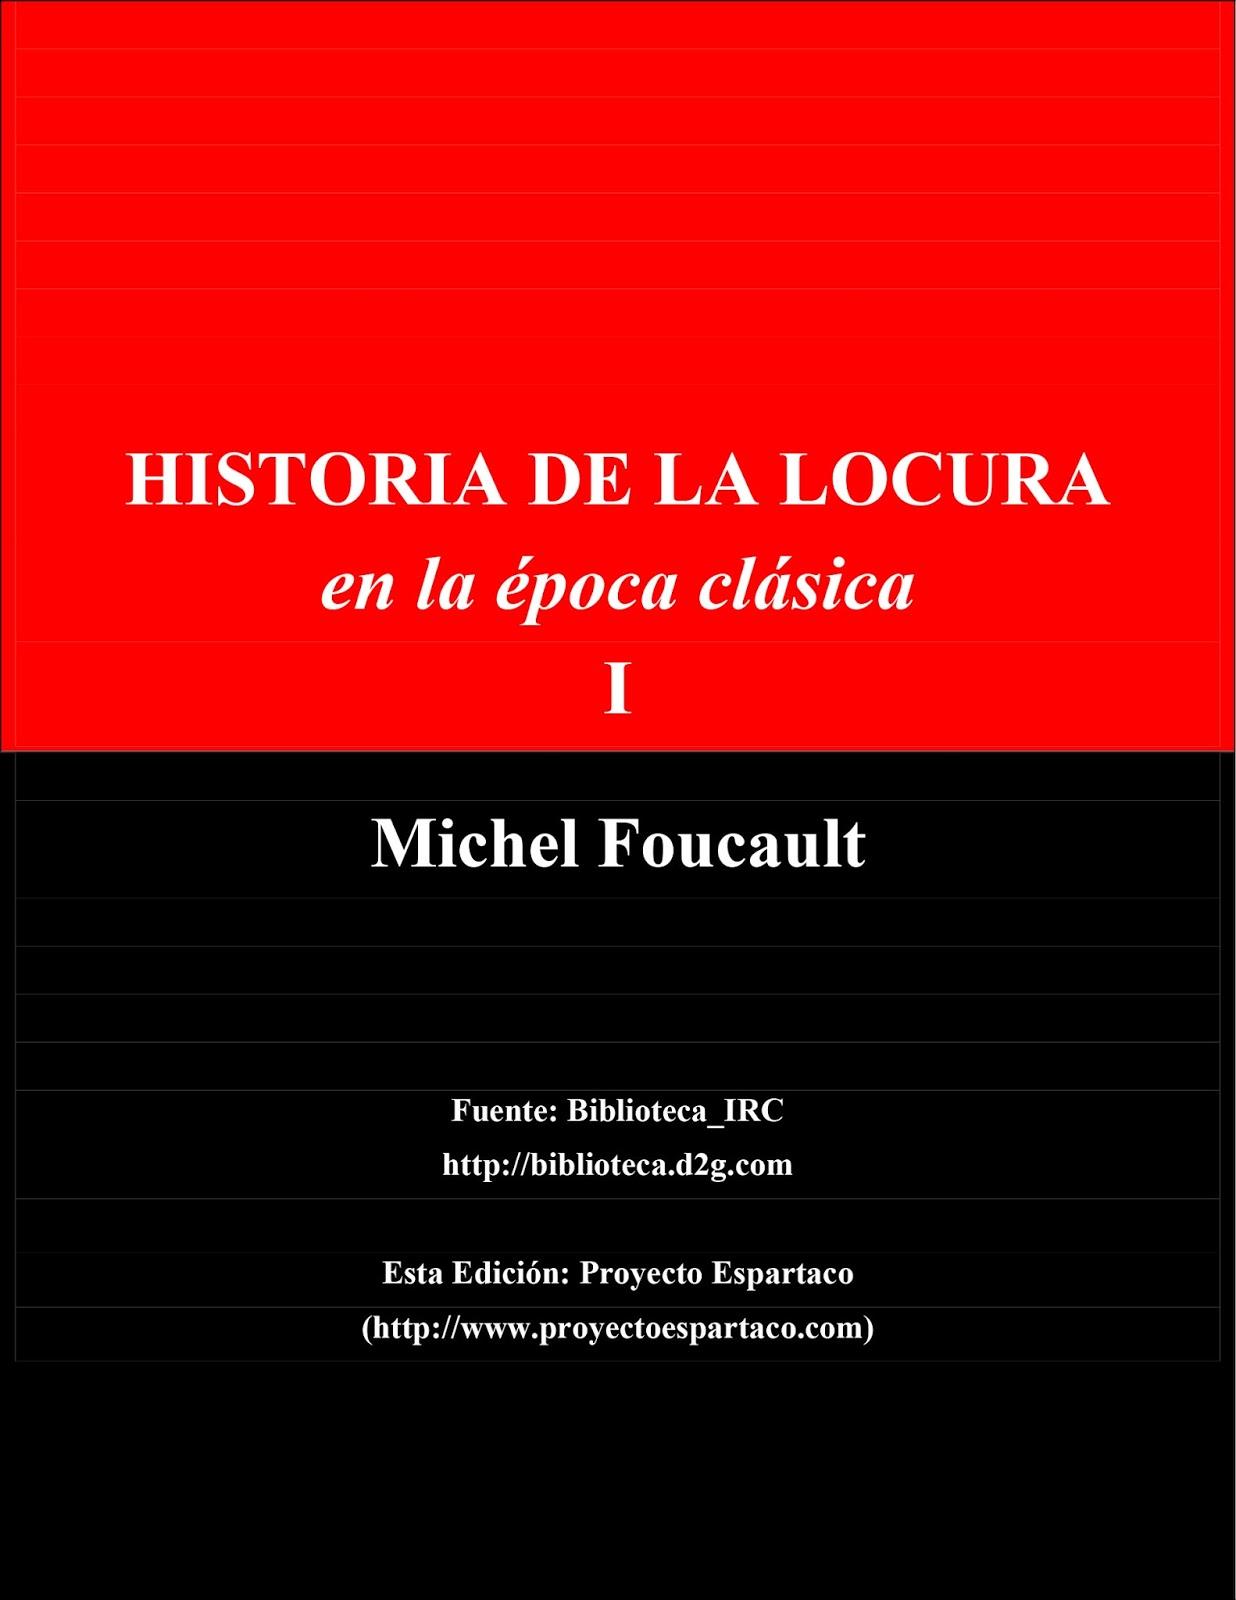 michel foucault 1961 historia de la locura en la poca On historia de la epoca clasica